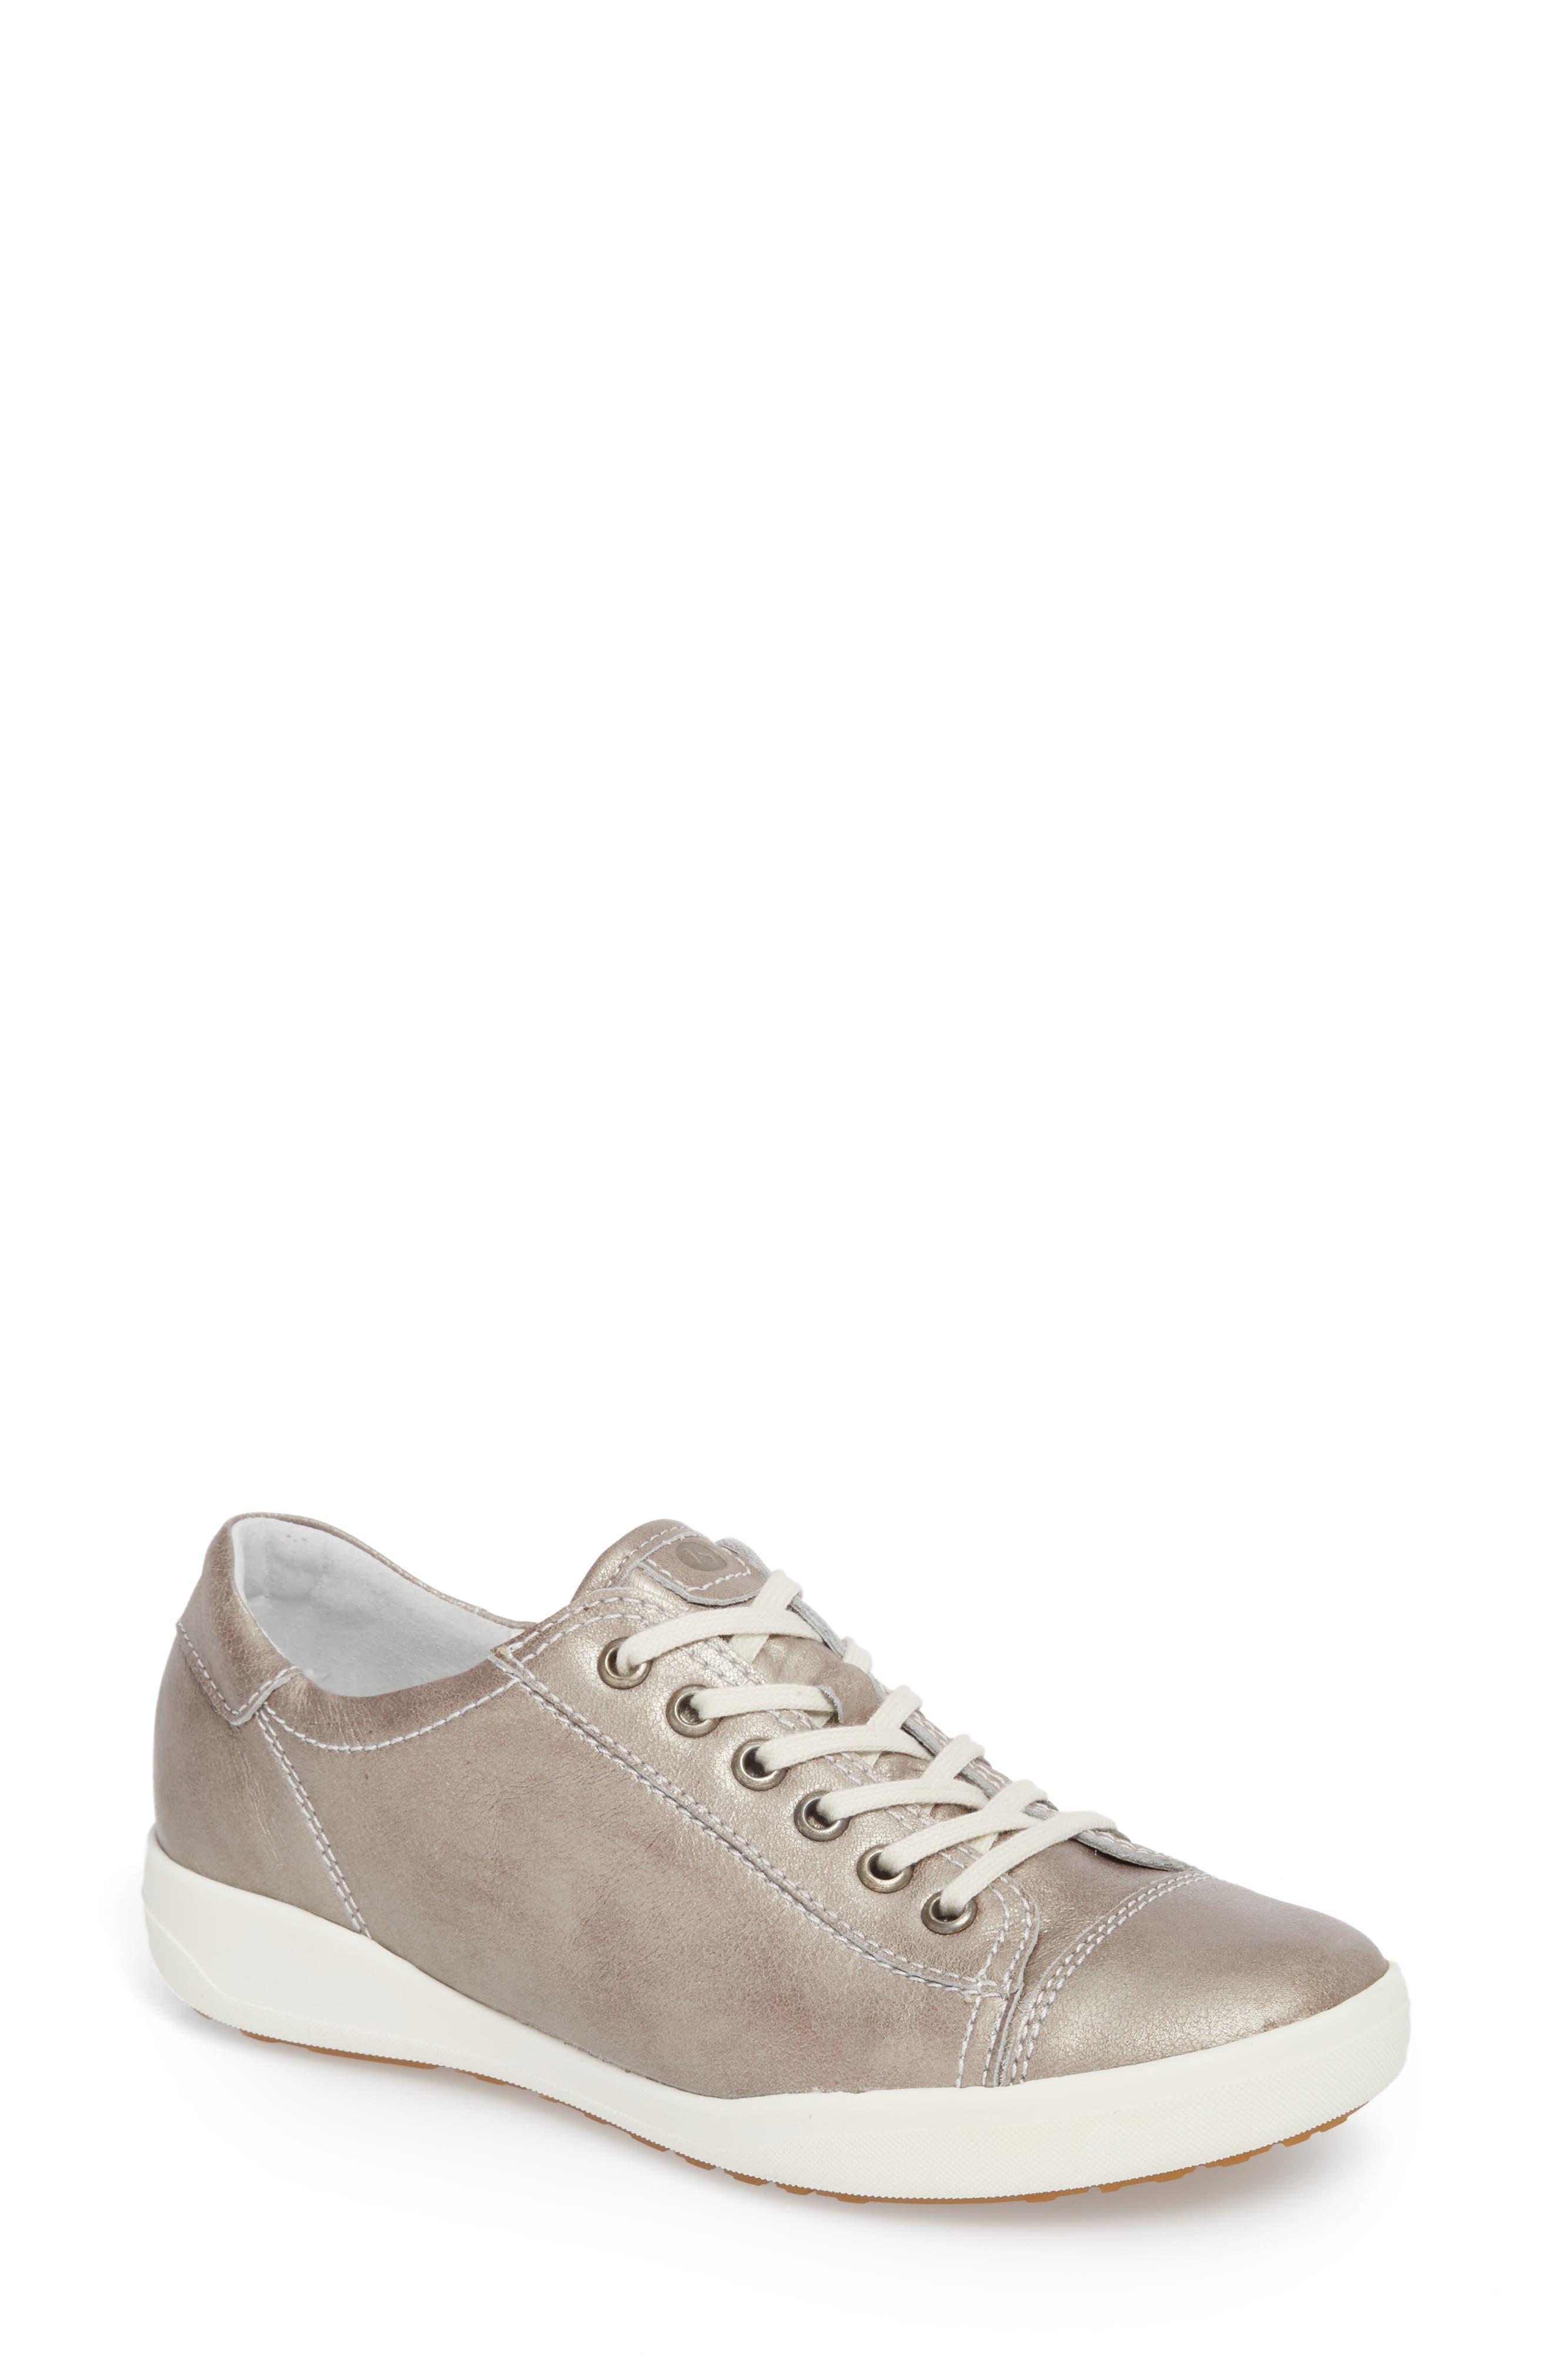 Sina 11 Sneaker,                             Main thumbnail 1, color,                             Platin Leather